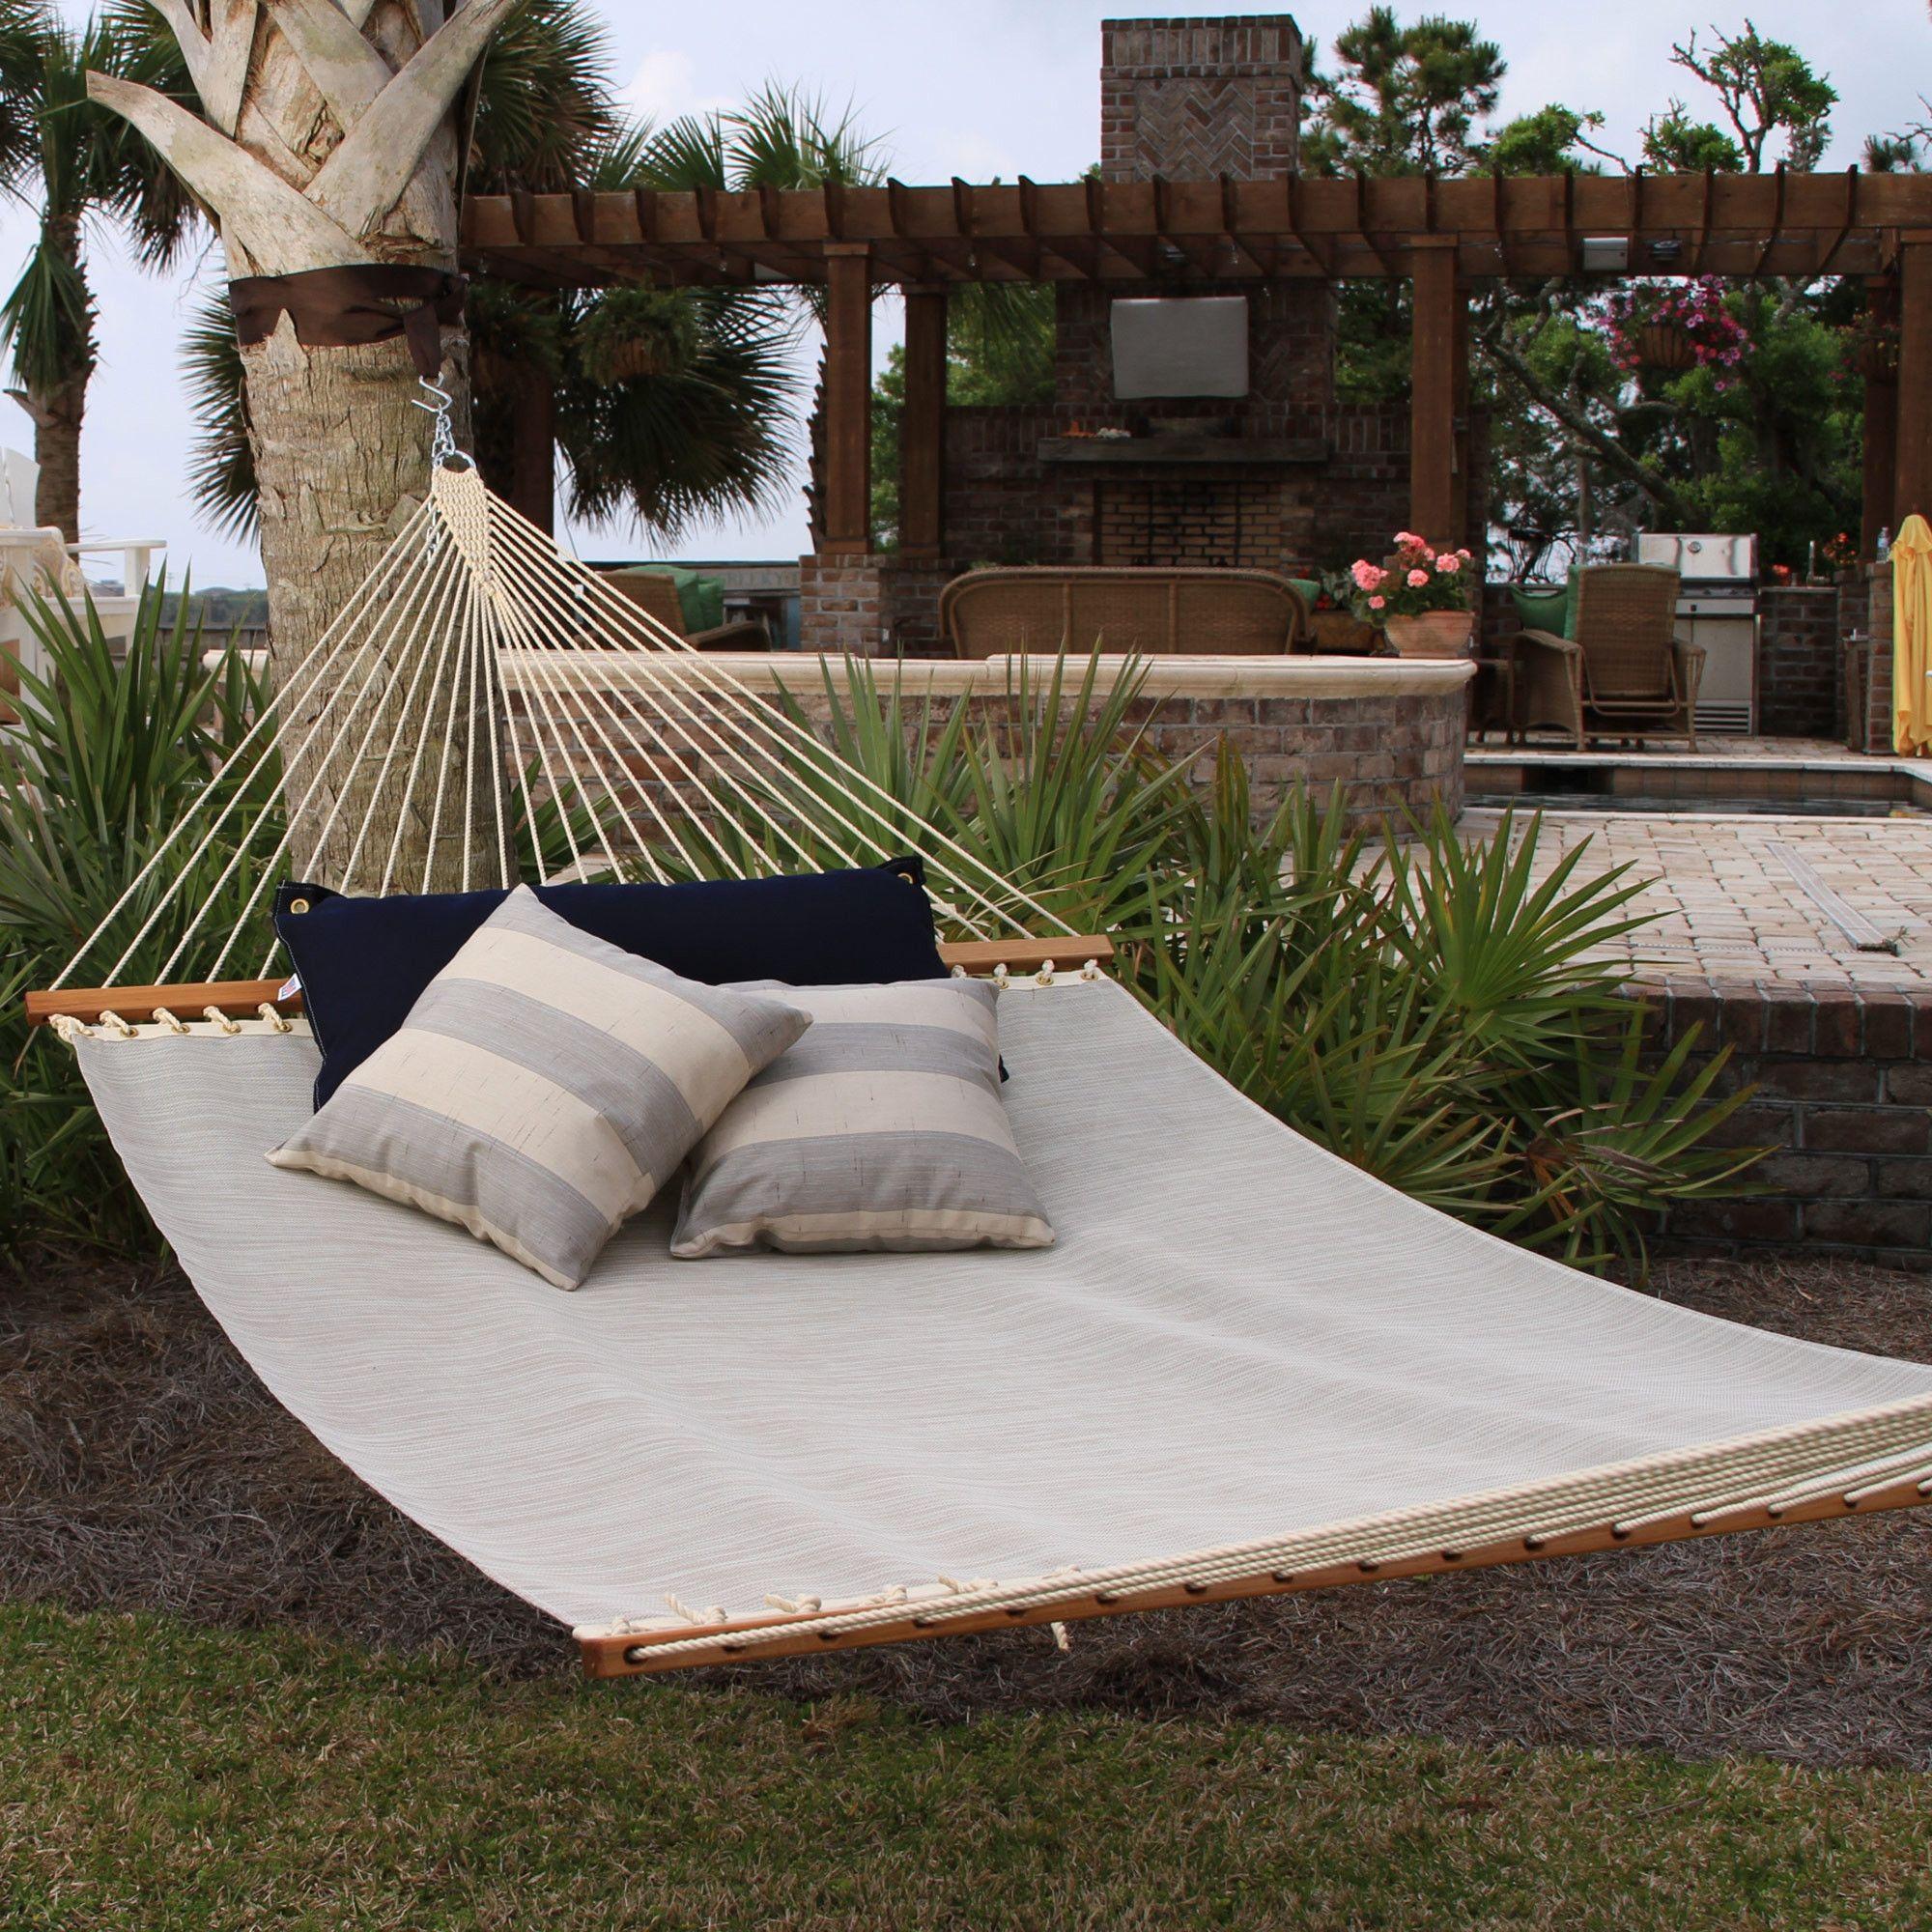 stand patio depot rope home green hammocks meadow b duracord pawleys outdoors n hammock island furniture the large